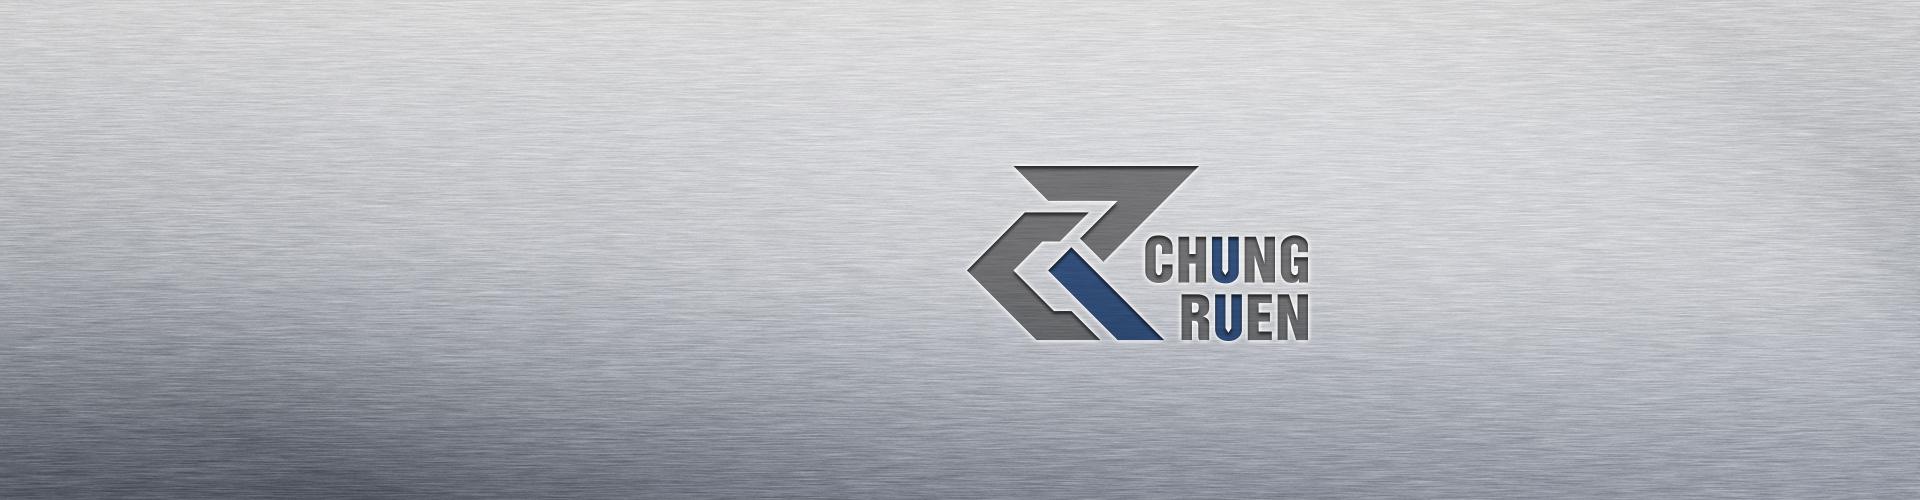 Chung Ruen Cis企業識別設計特殊名片設計瞳拾設計